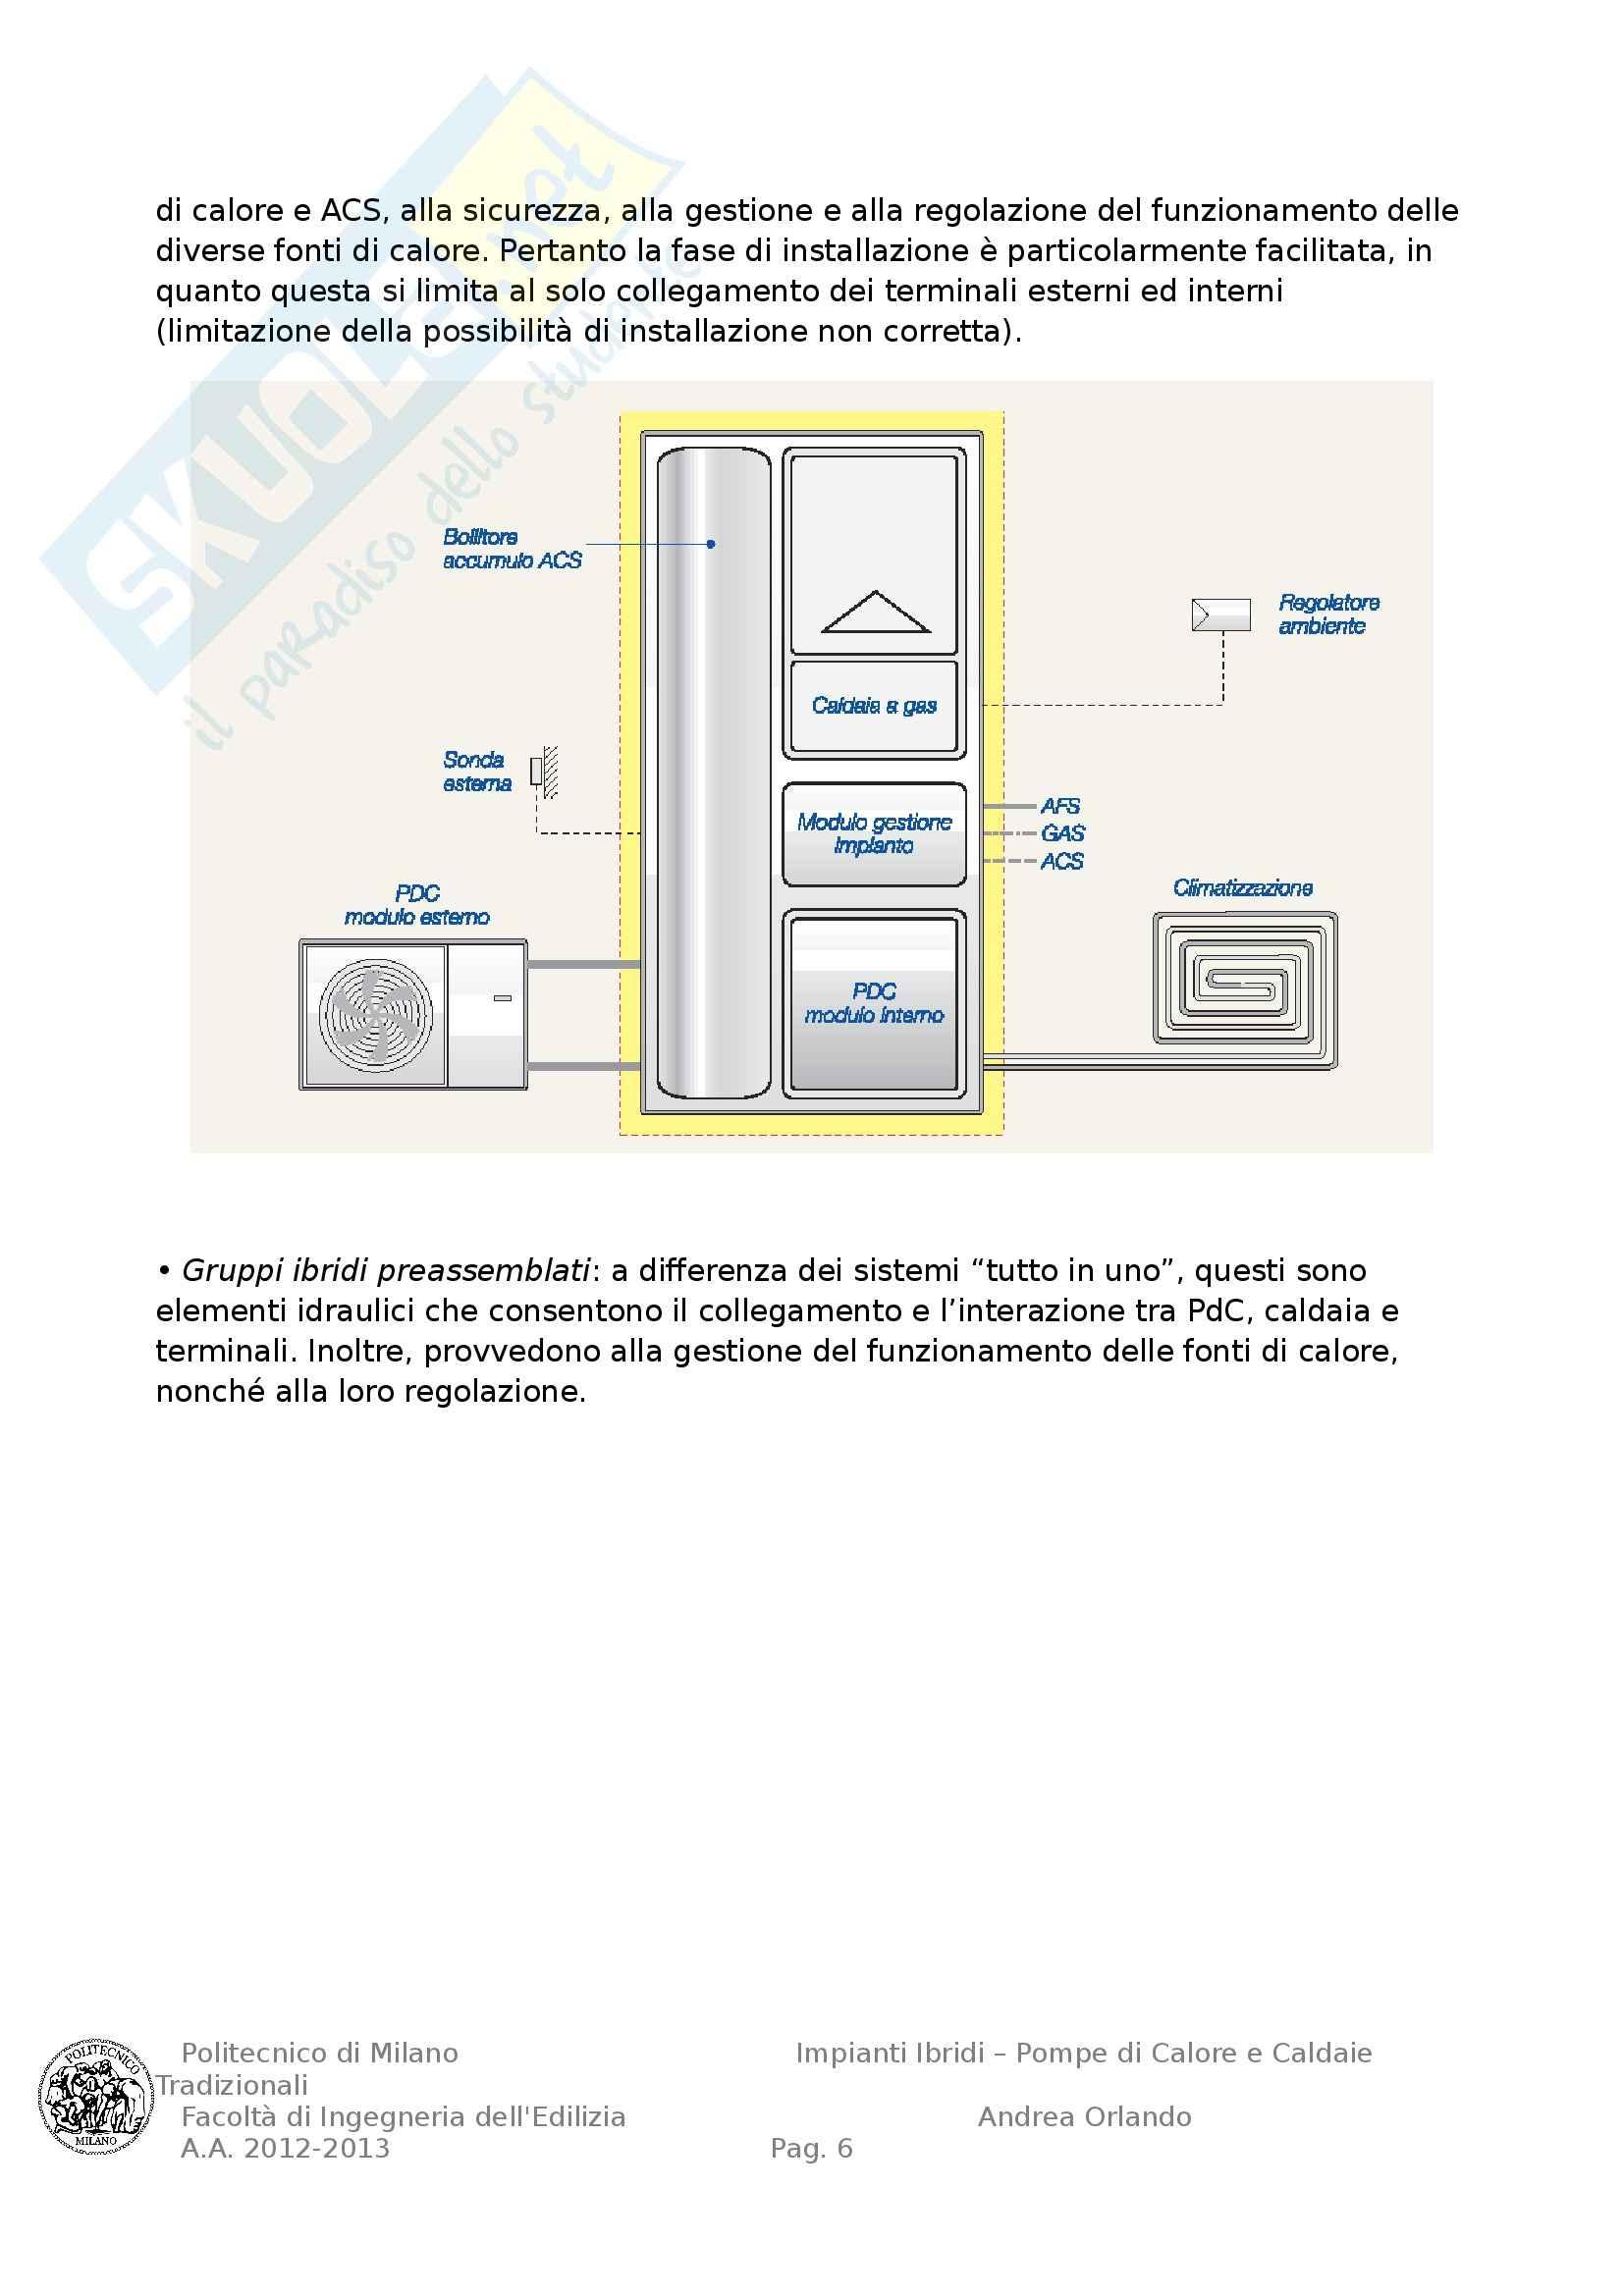 Impianti Ibridi Pompe di Calore e Caldaie Tradizionali, Tesi Pag. 6